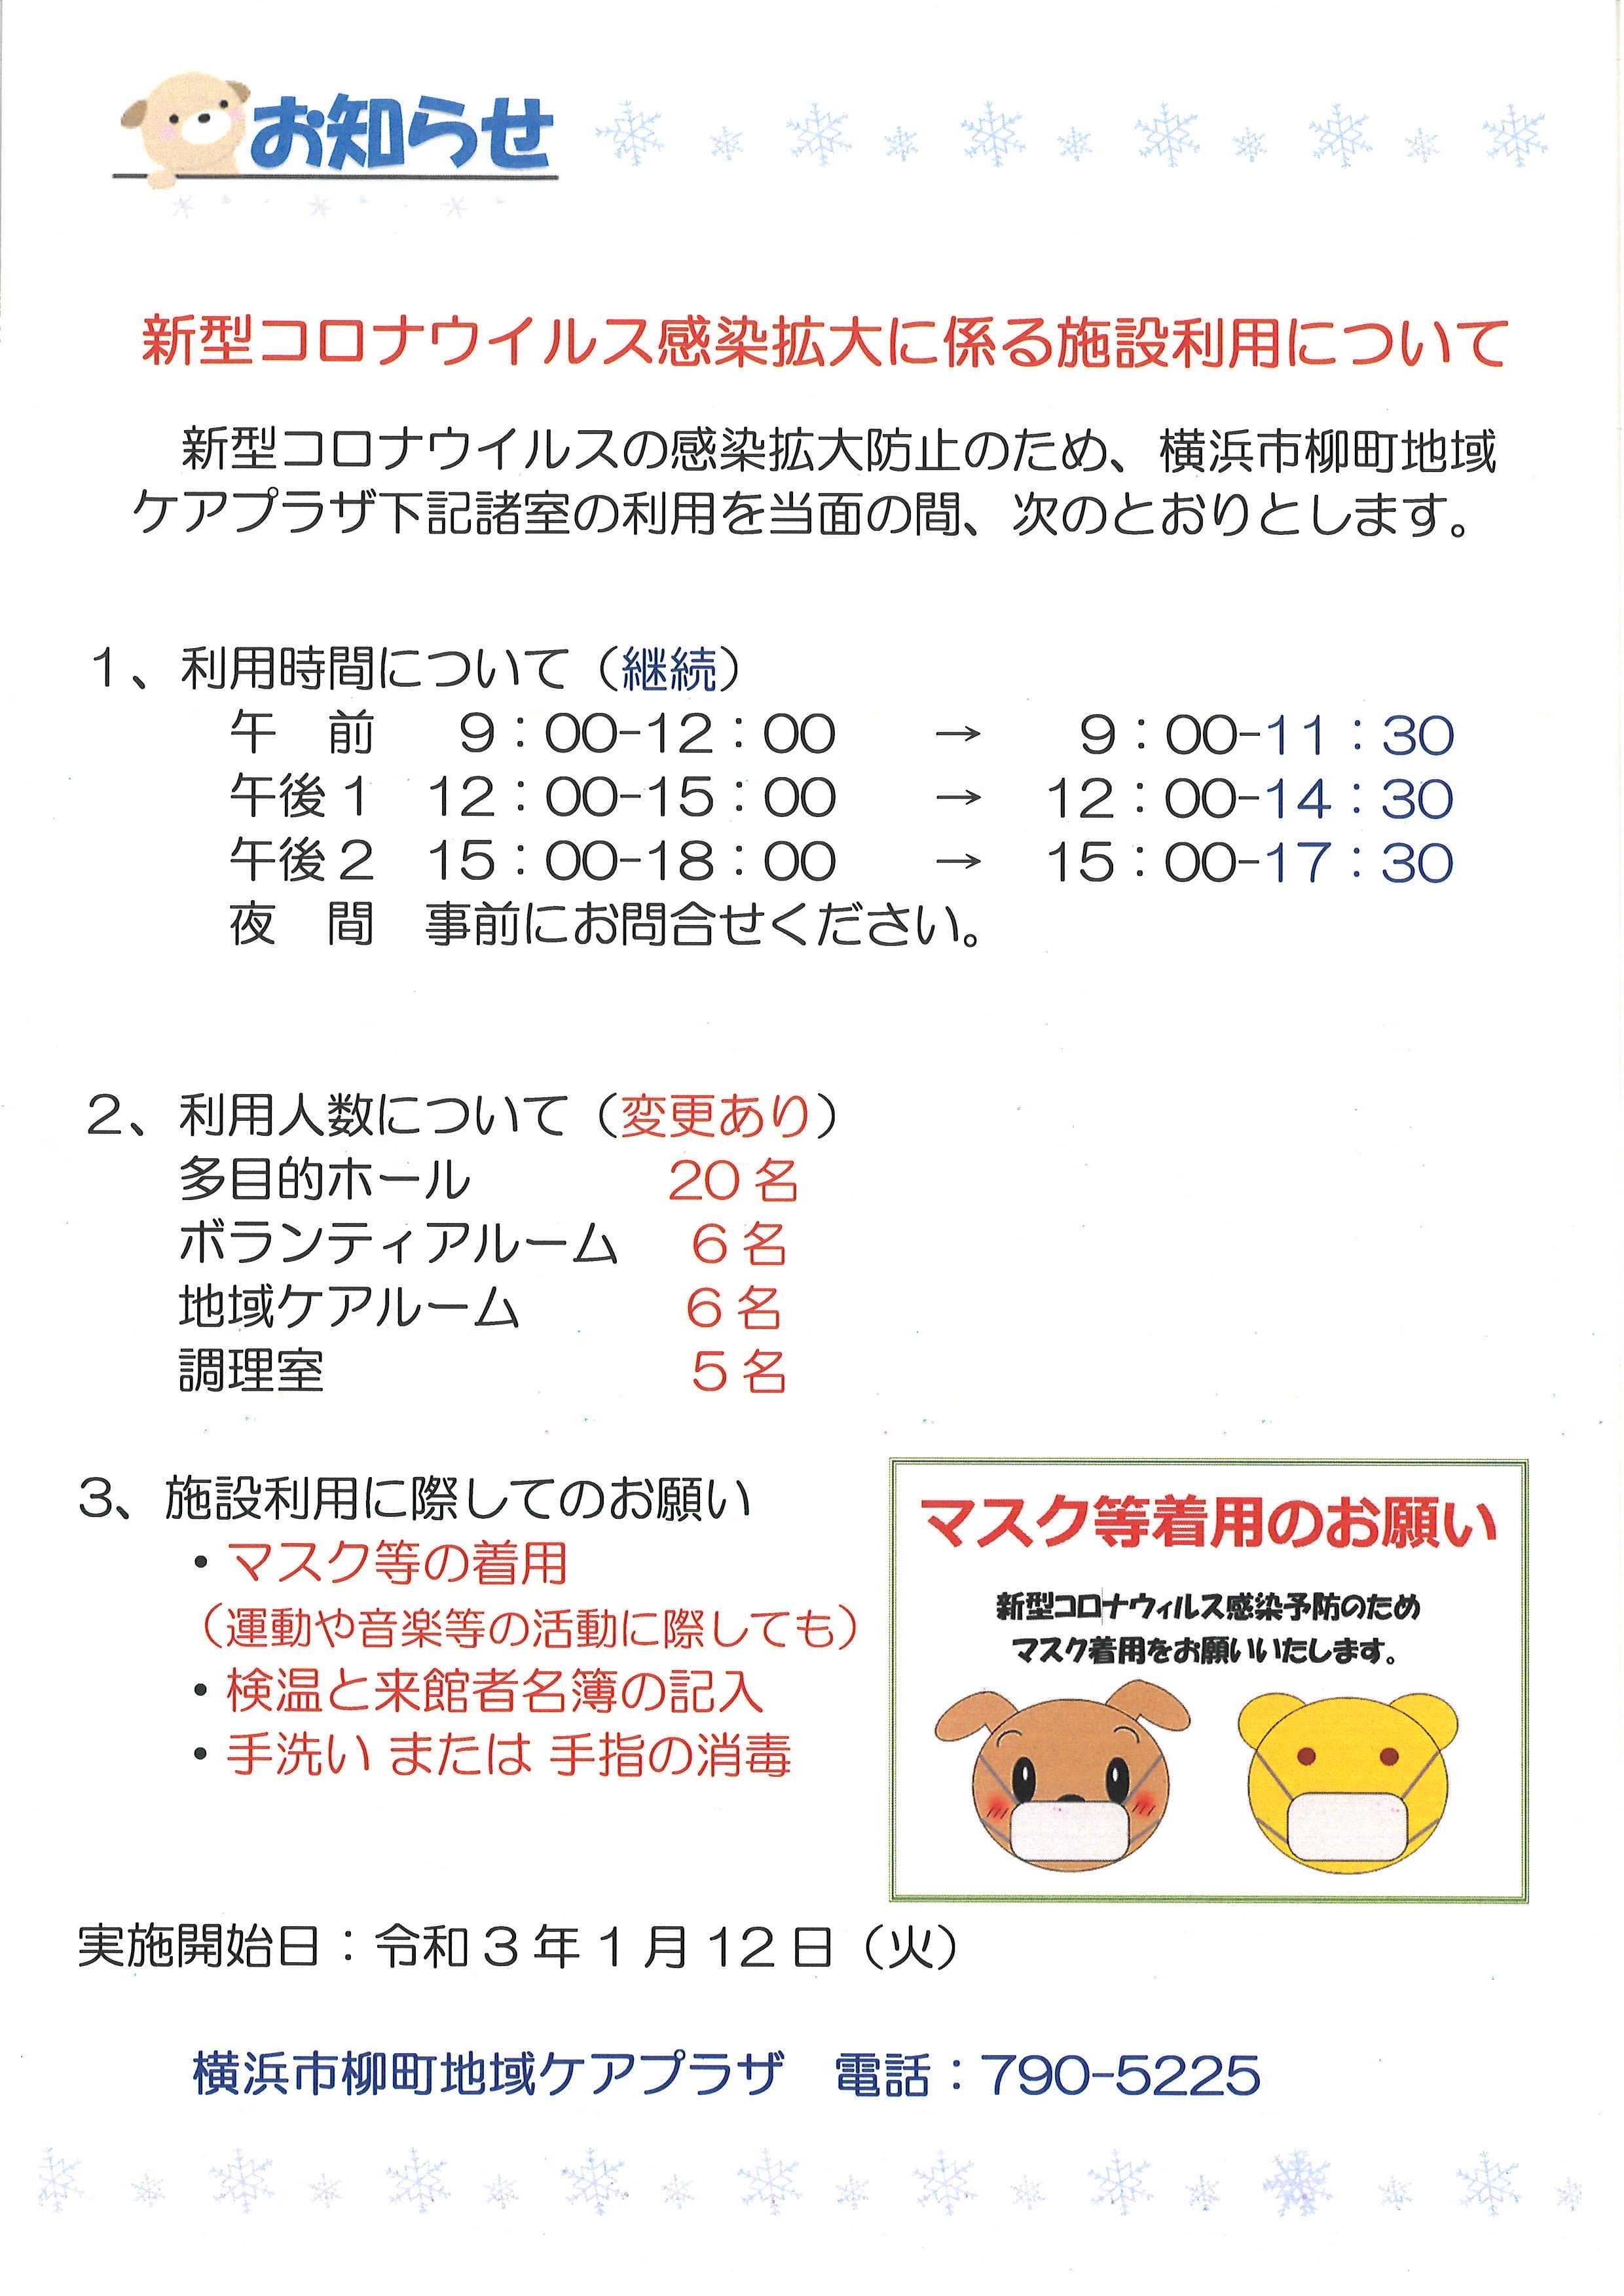 https://www.suminasu.or.jp/global-data/20210114103335994.jpg